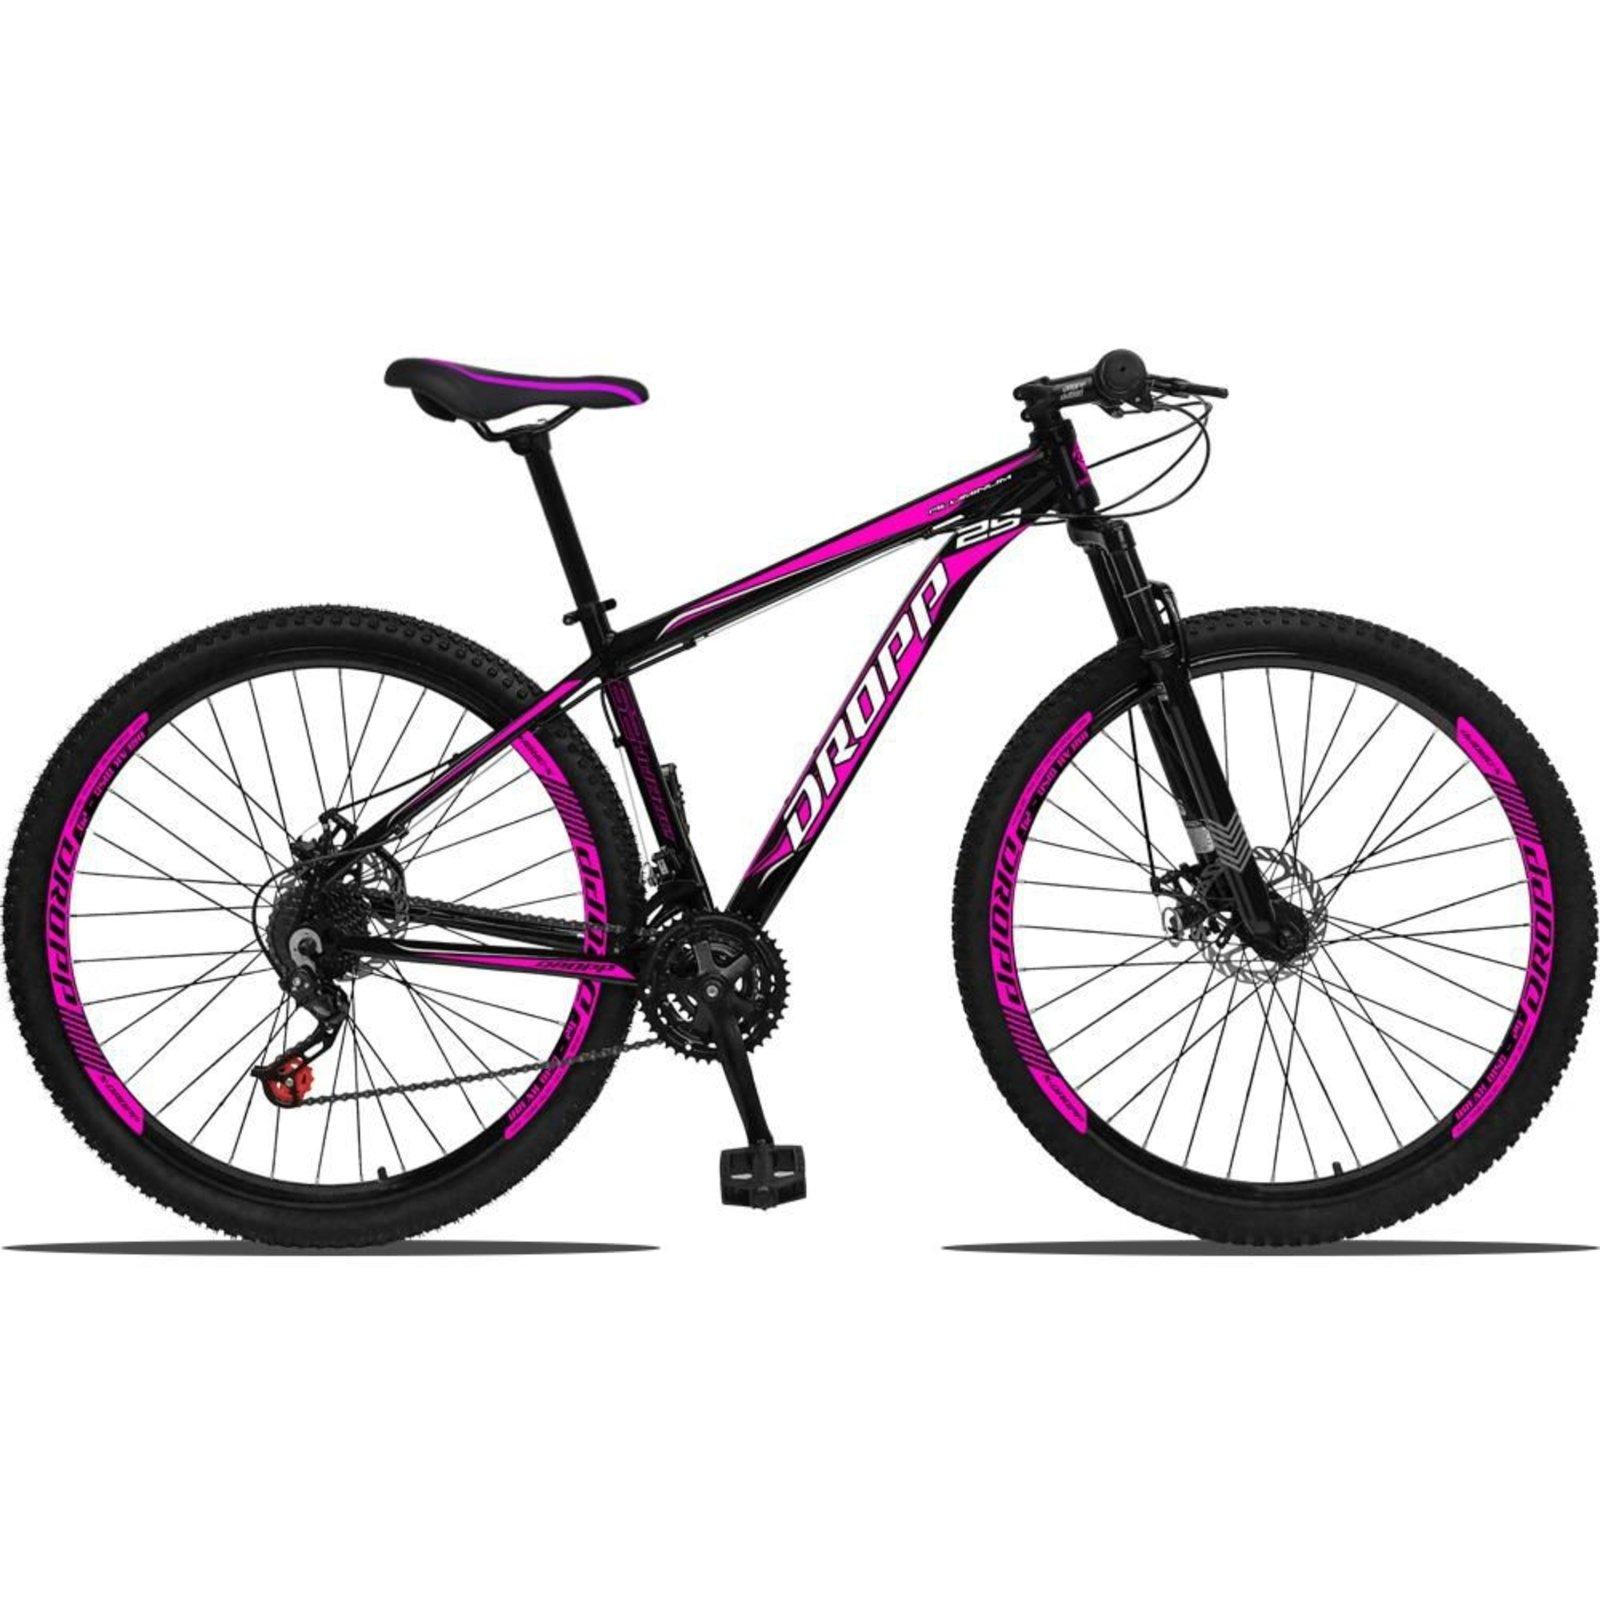 Bicicleta Dropp Aluminum T15 Aro 29 Susp. Dianteira 21 Marchas - Preto/rosa